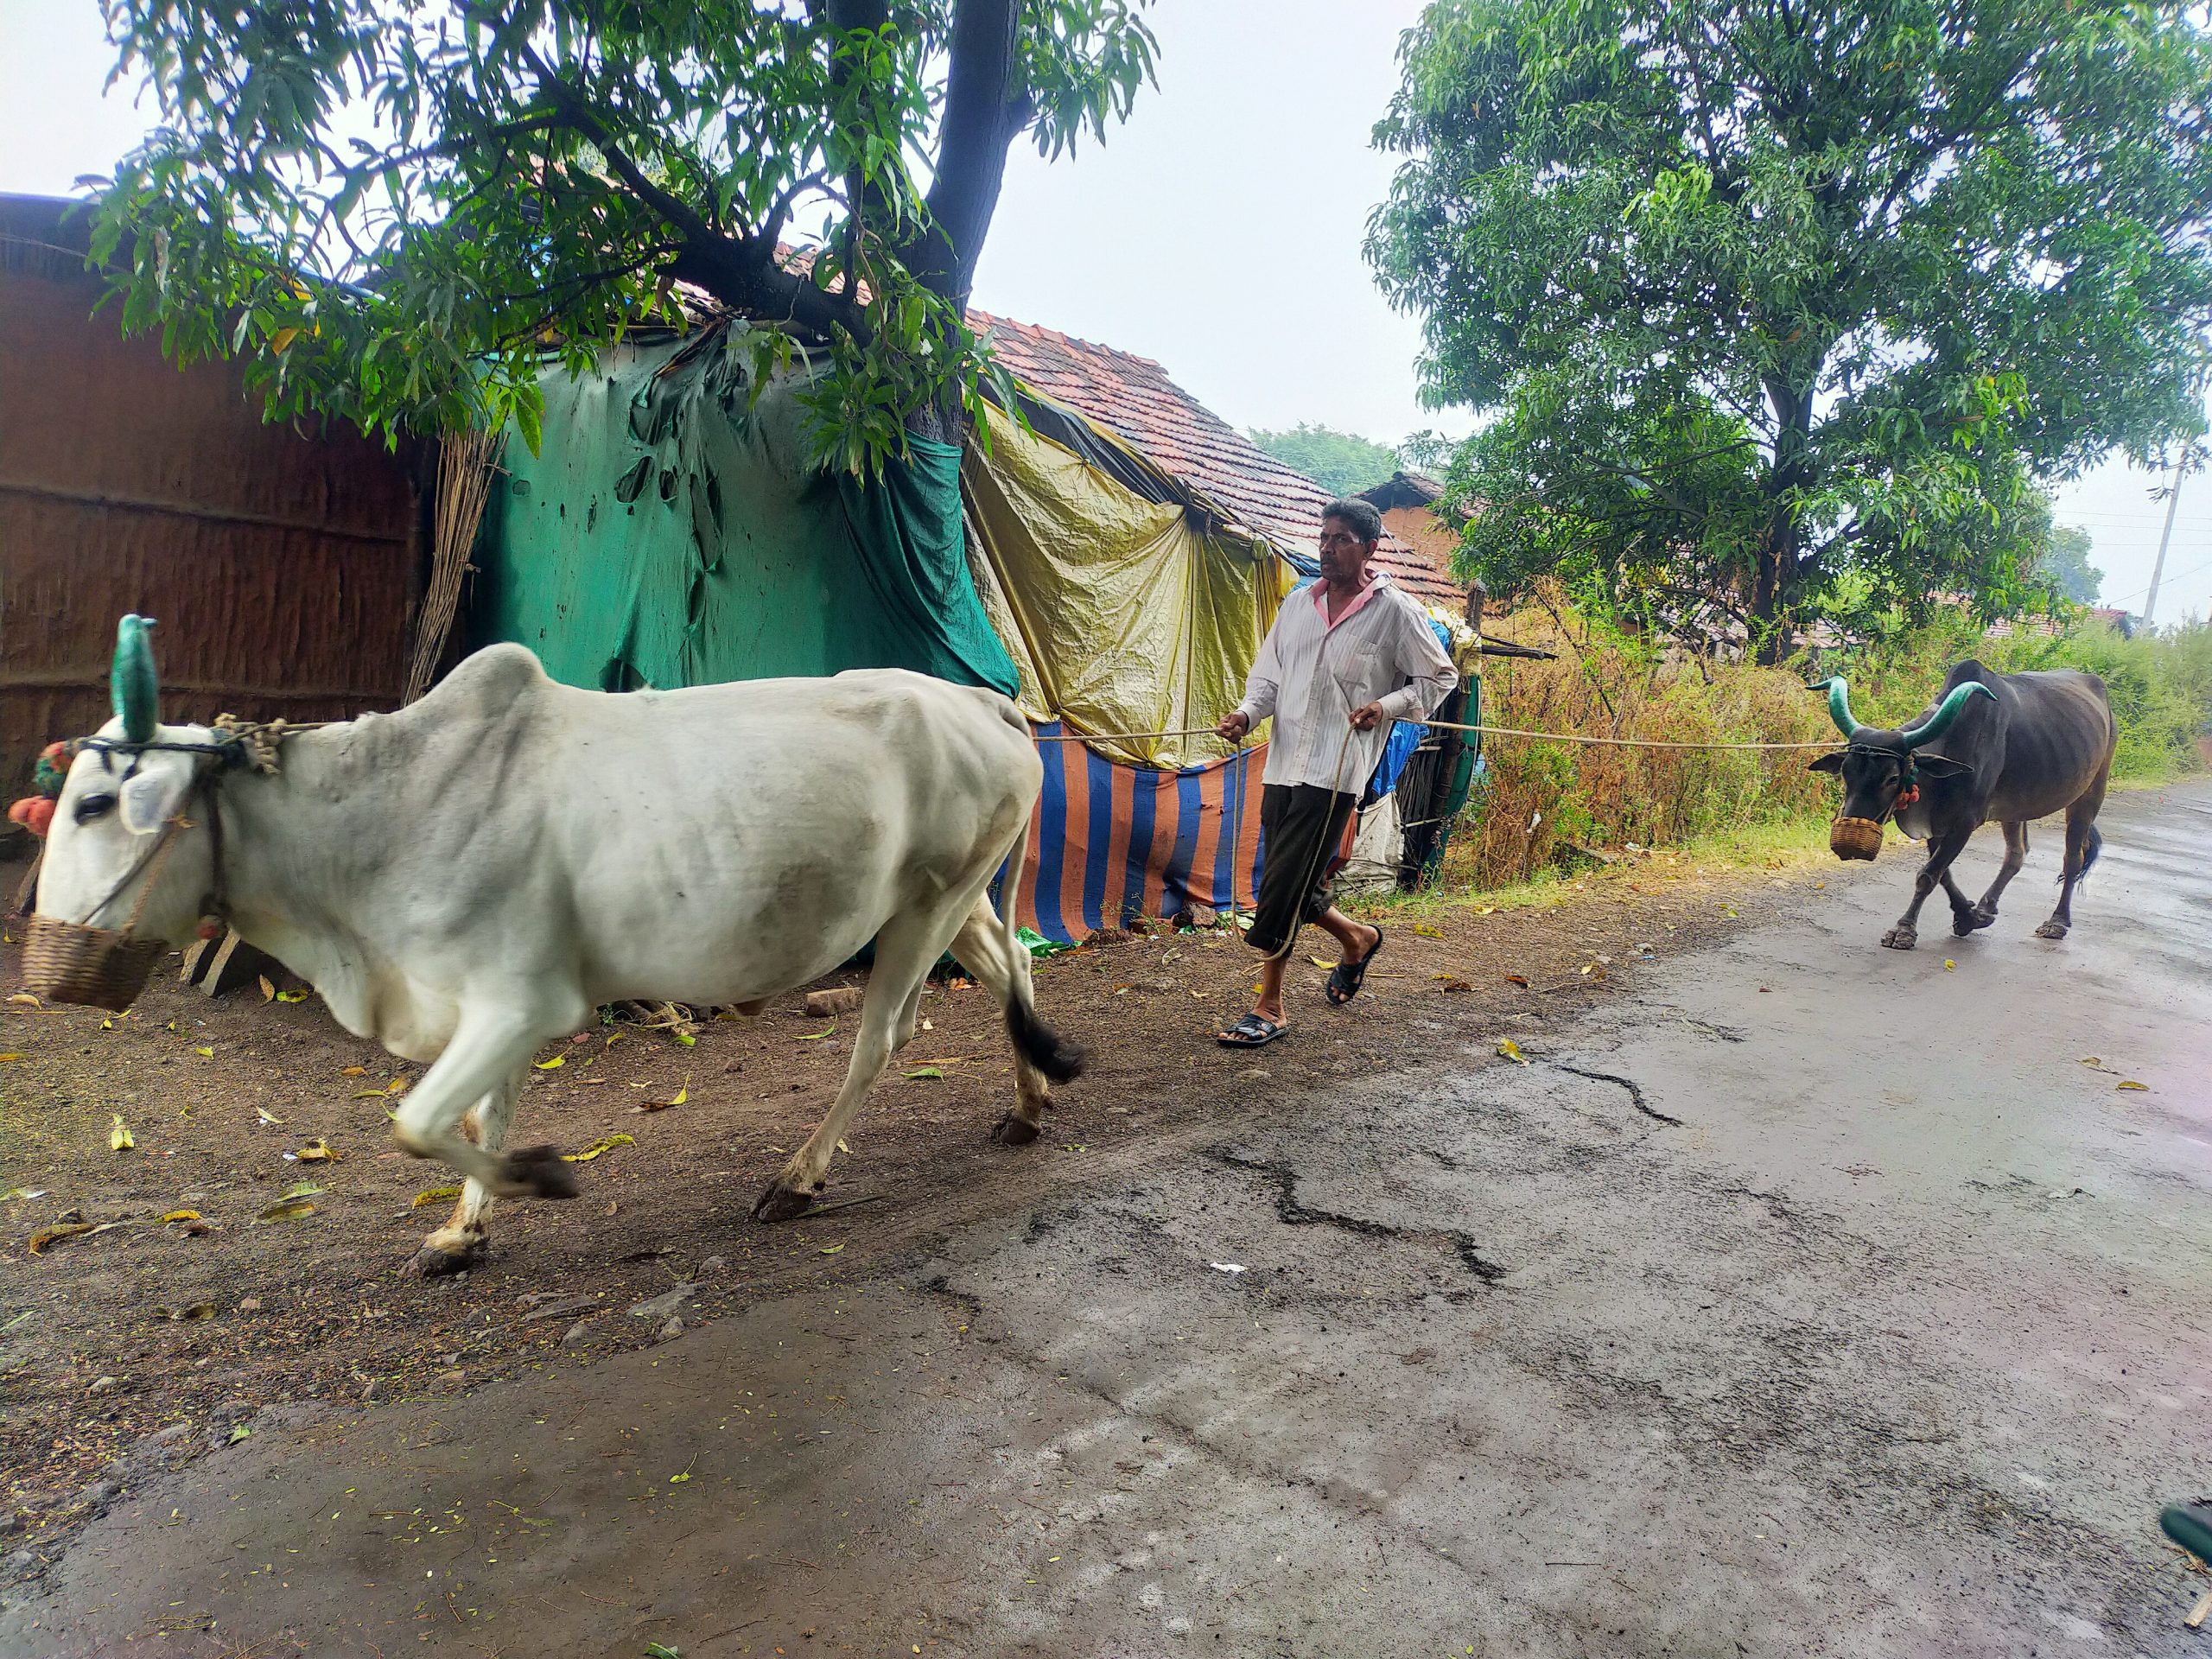 A farmer with his oxen